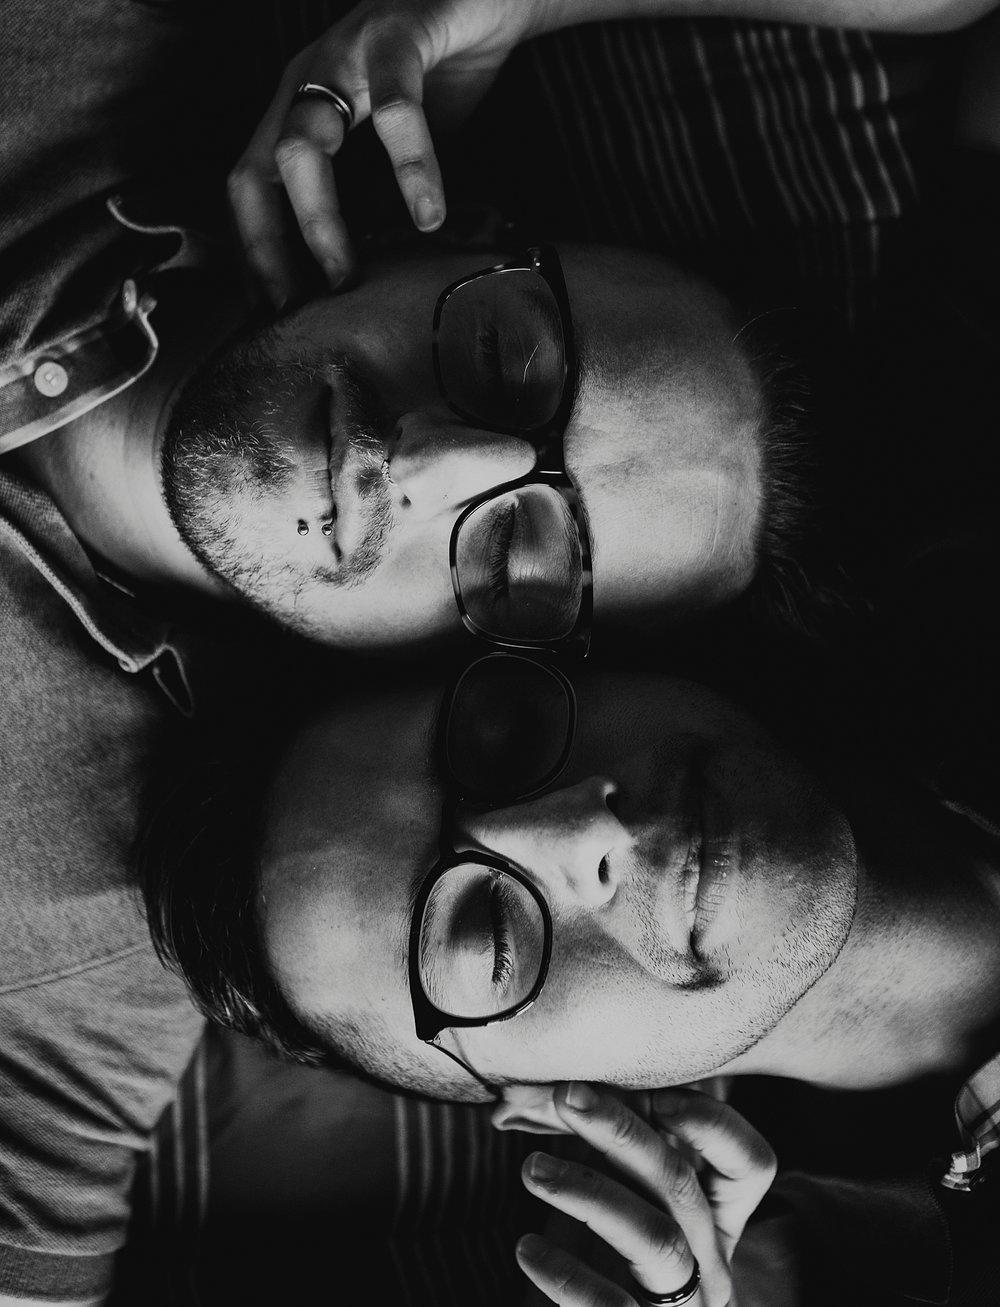 Joe_mac_Creative_Best_Philadelphia_Wedding_photography_Gay_LGBTQ_Queer_Two_Grooms_0024.jpg